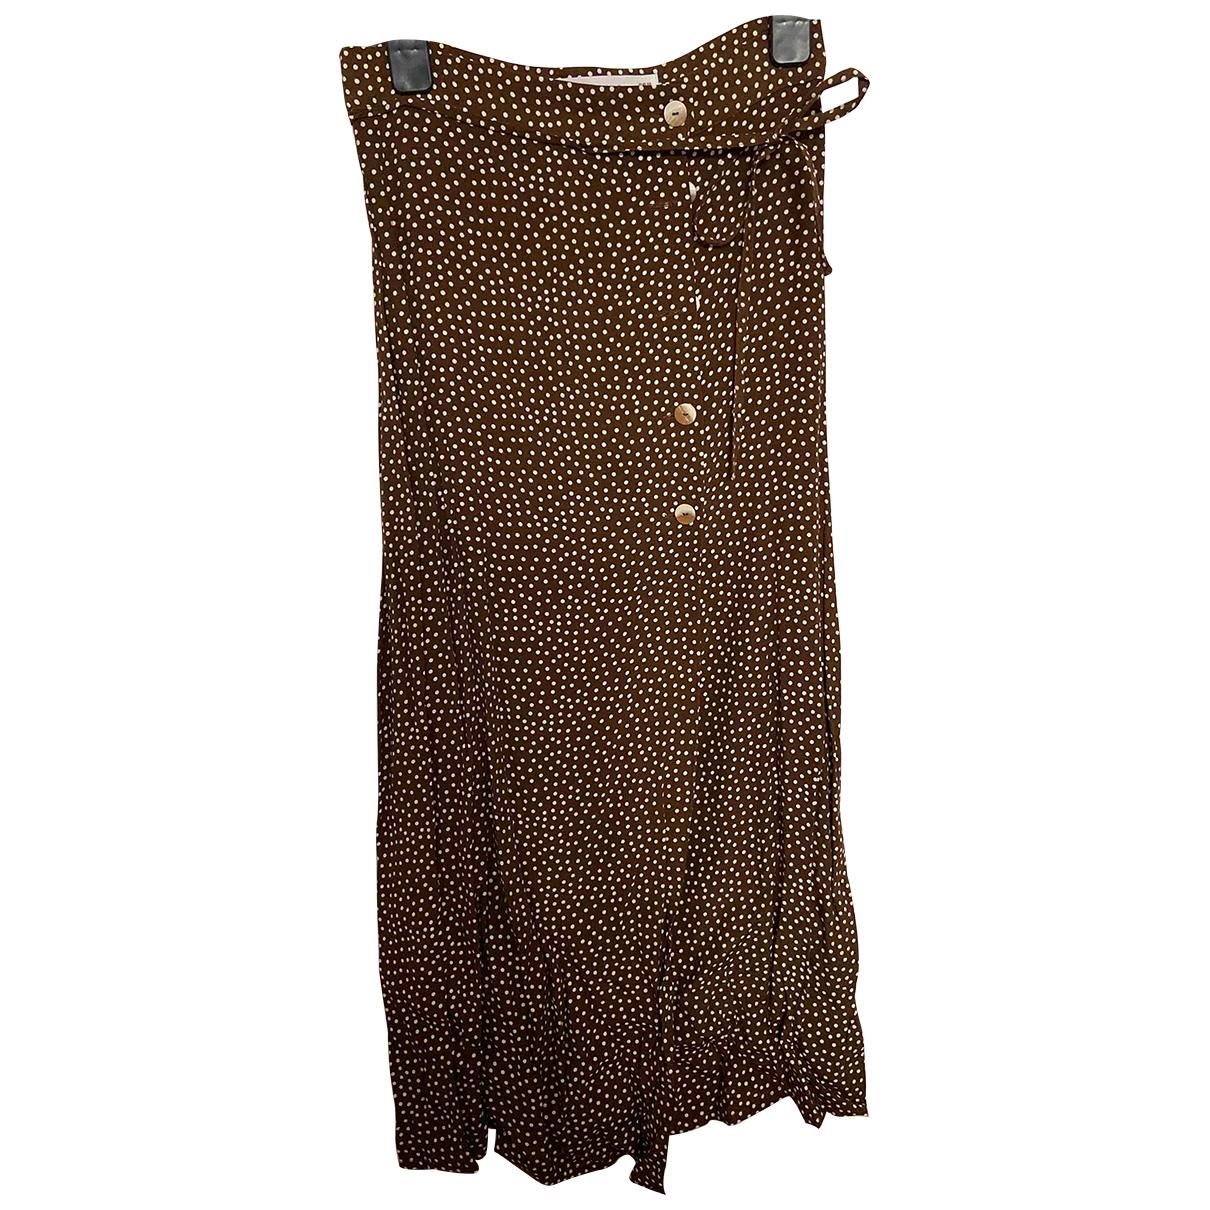 Mango \N Brown skirt for Women XS International